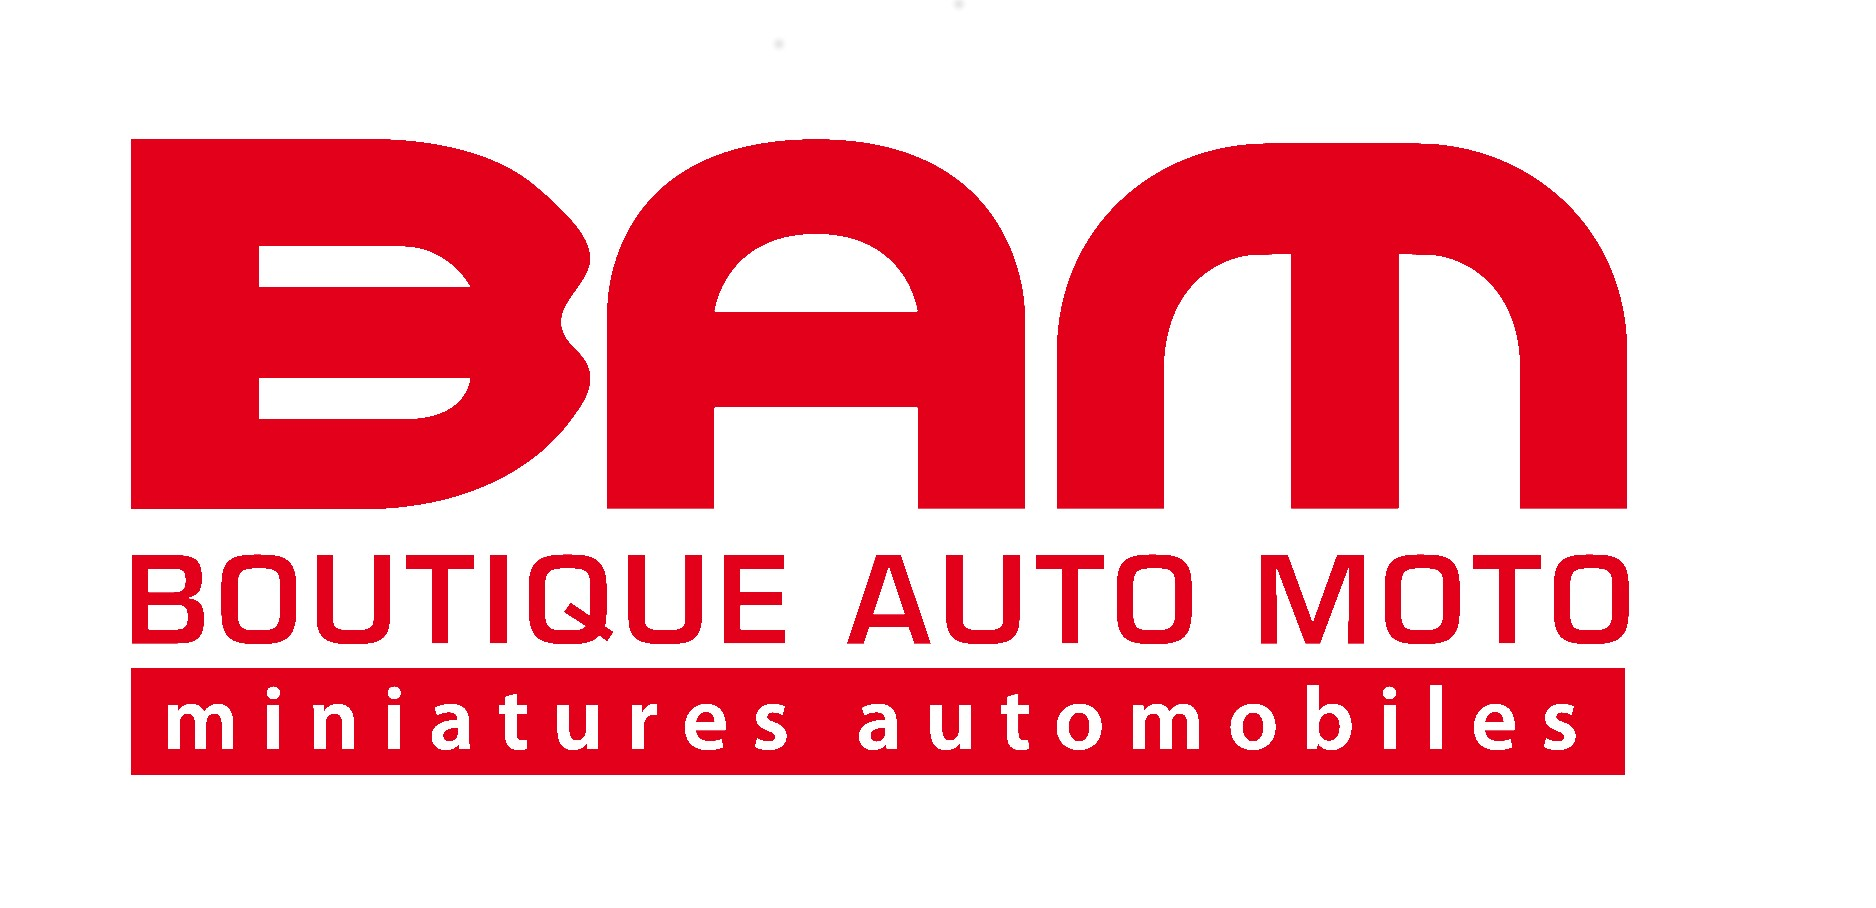 Boutique Auto Moto / SPARK